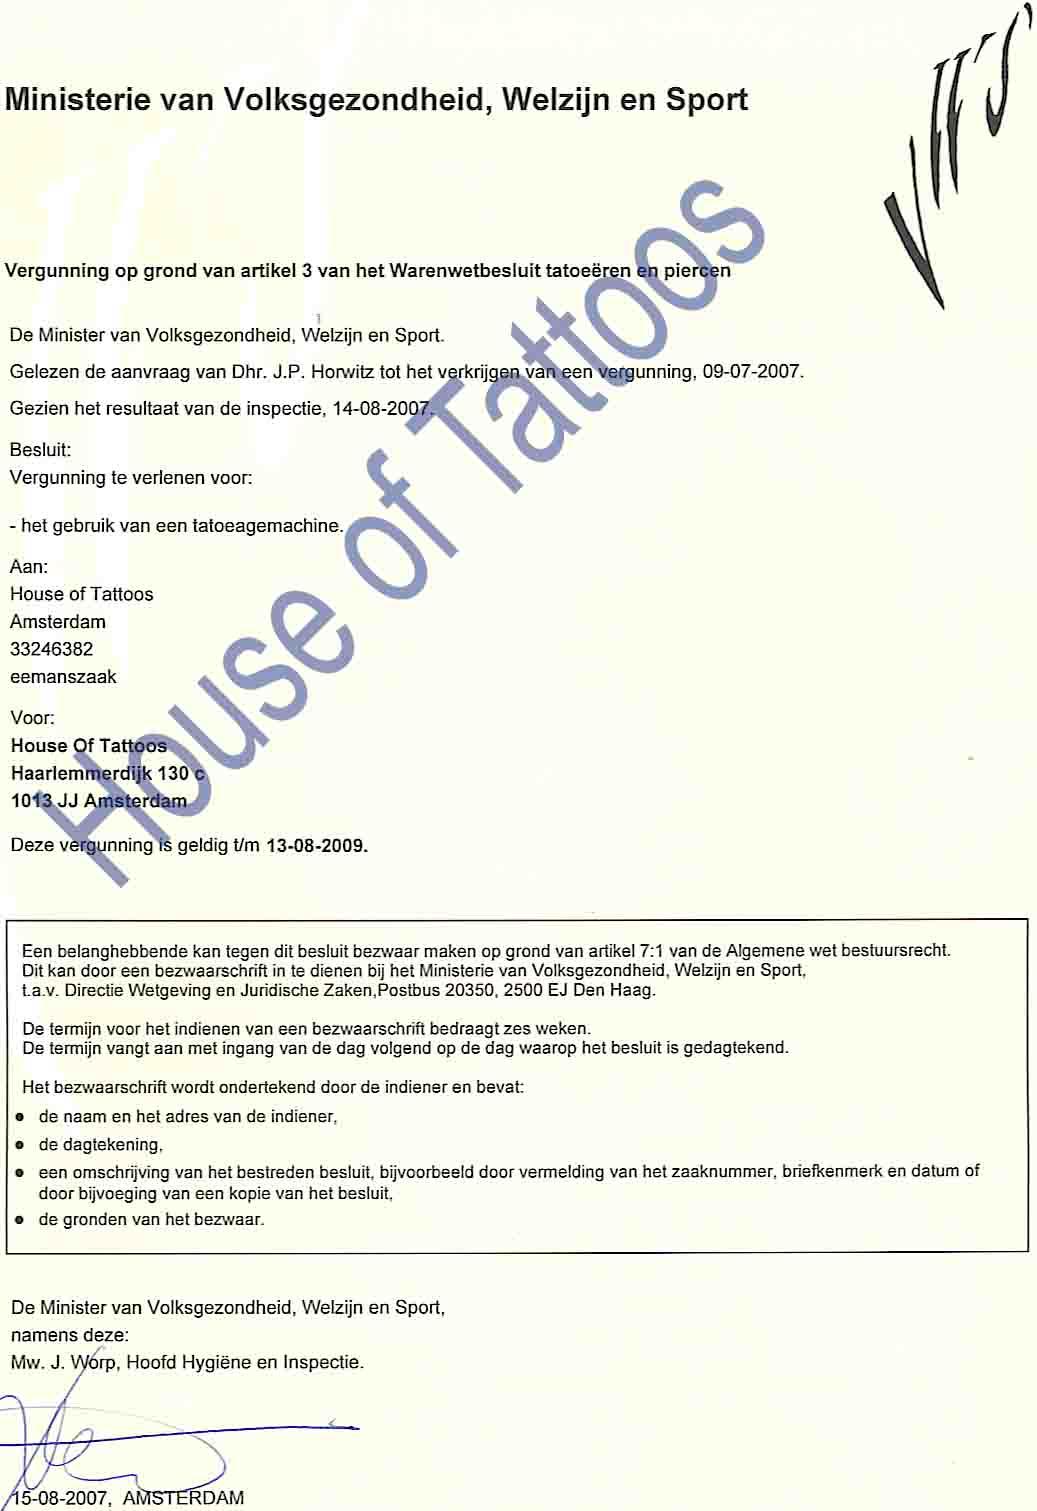 house-of-tattoos-vergunning-old